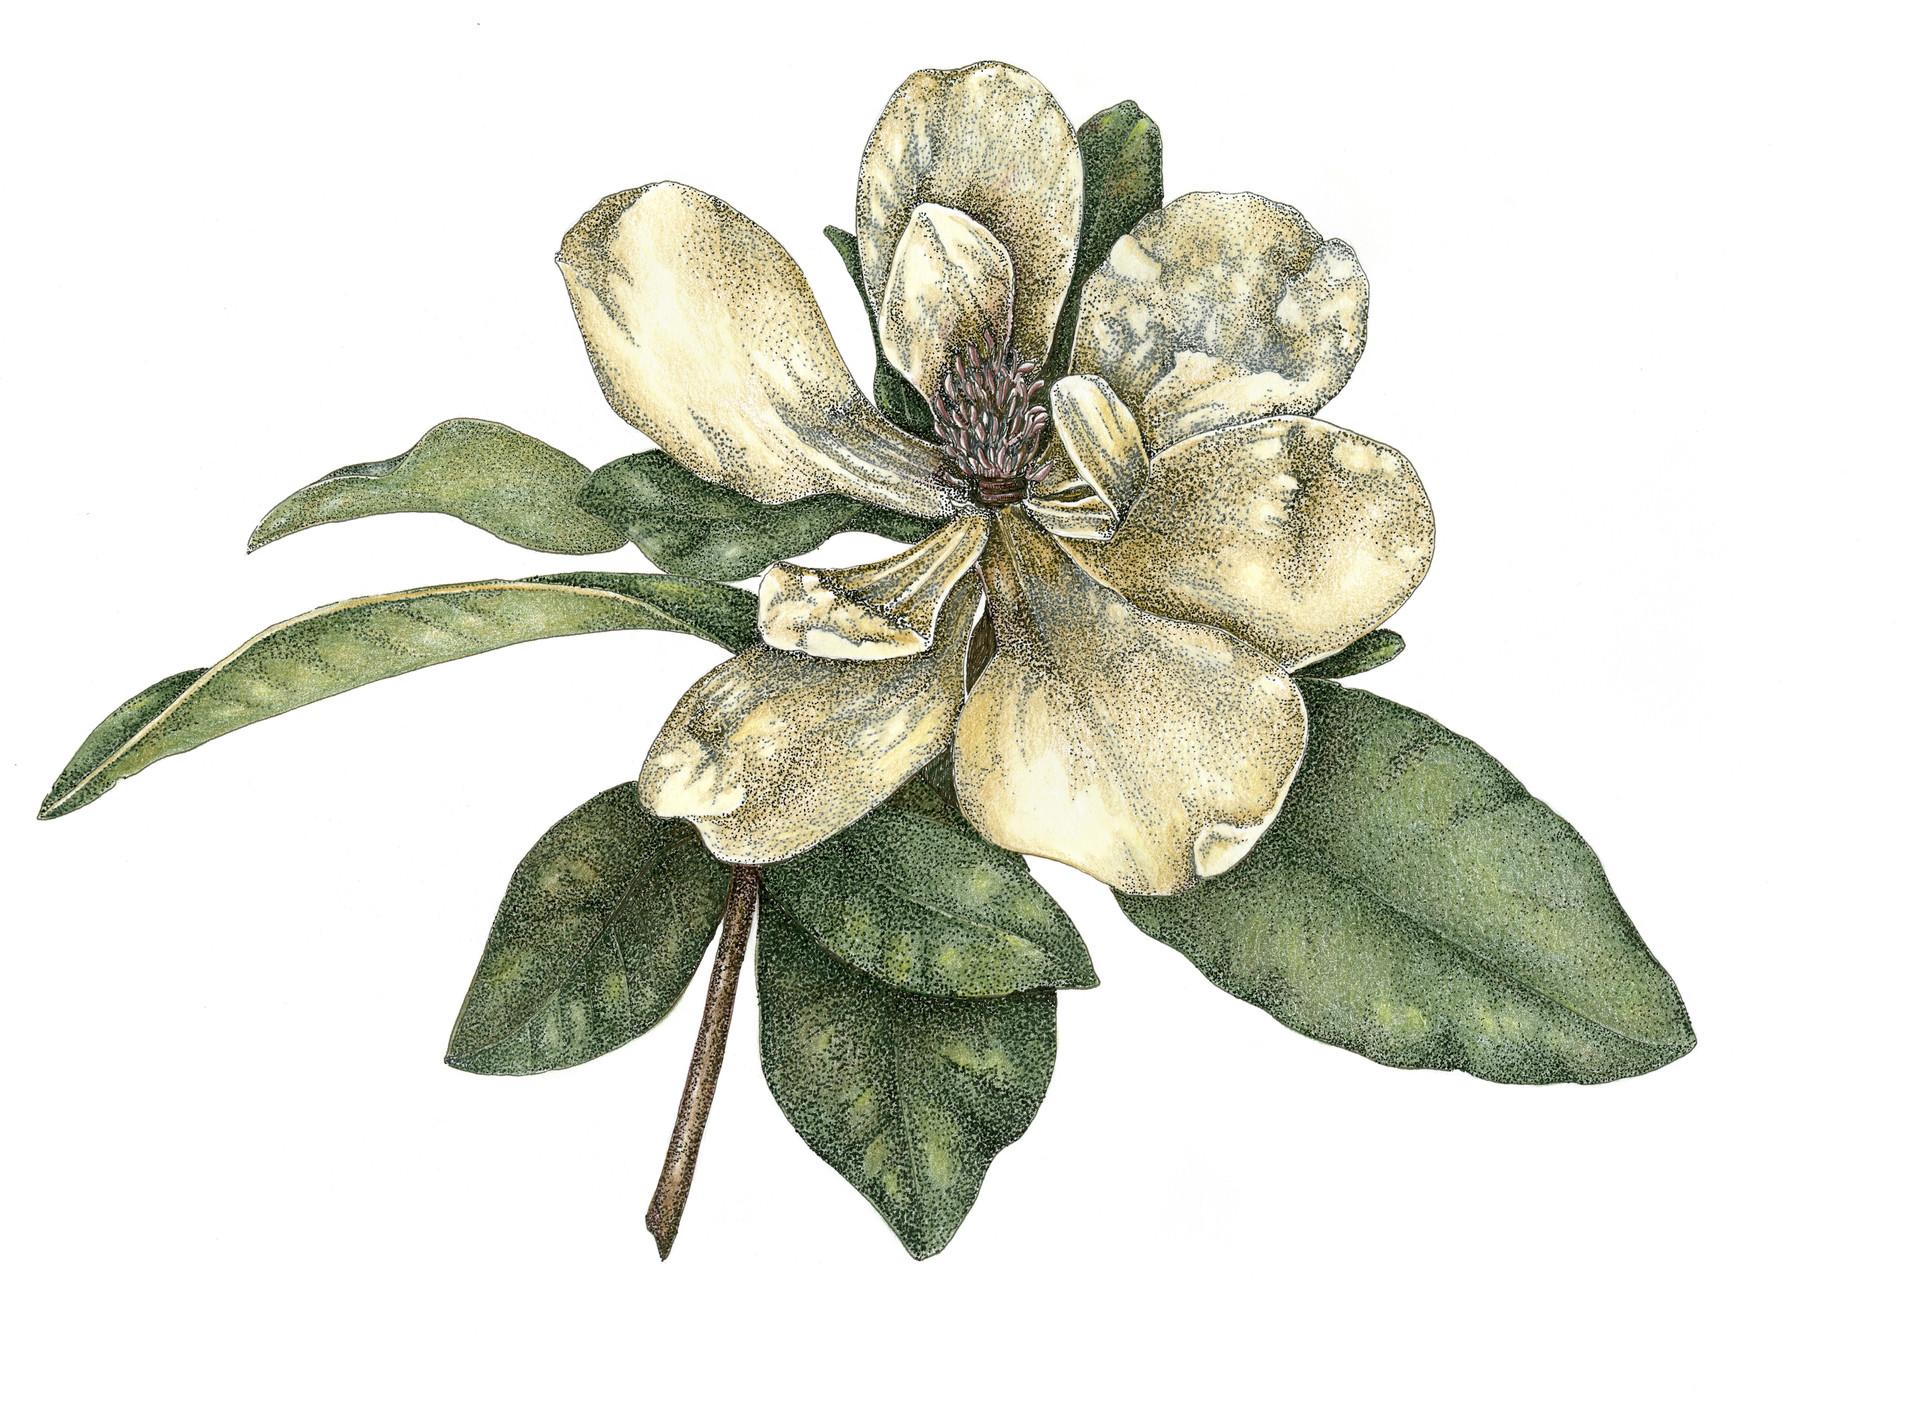 Magnolia in Pen and Pencil